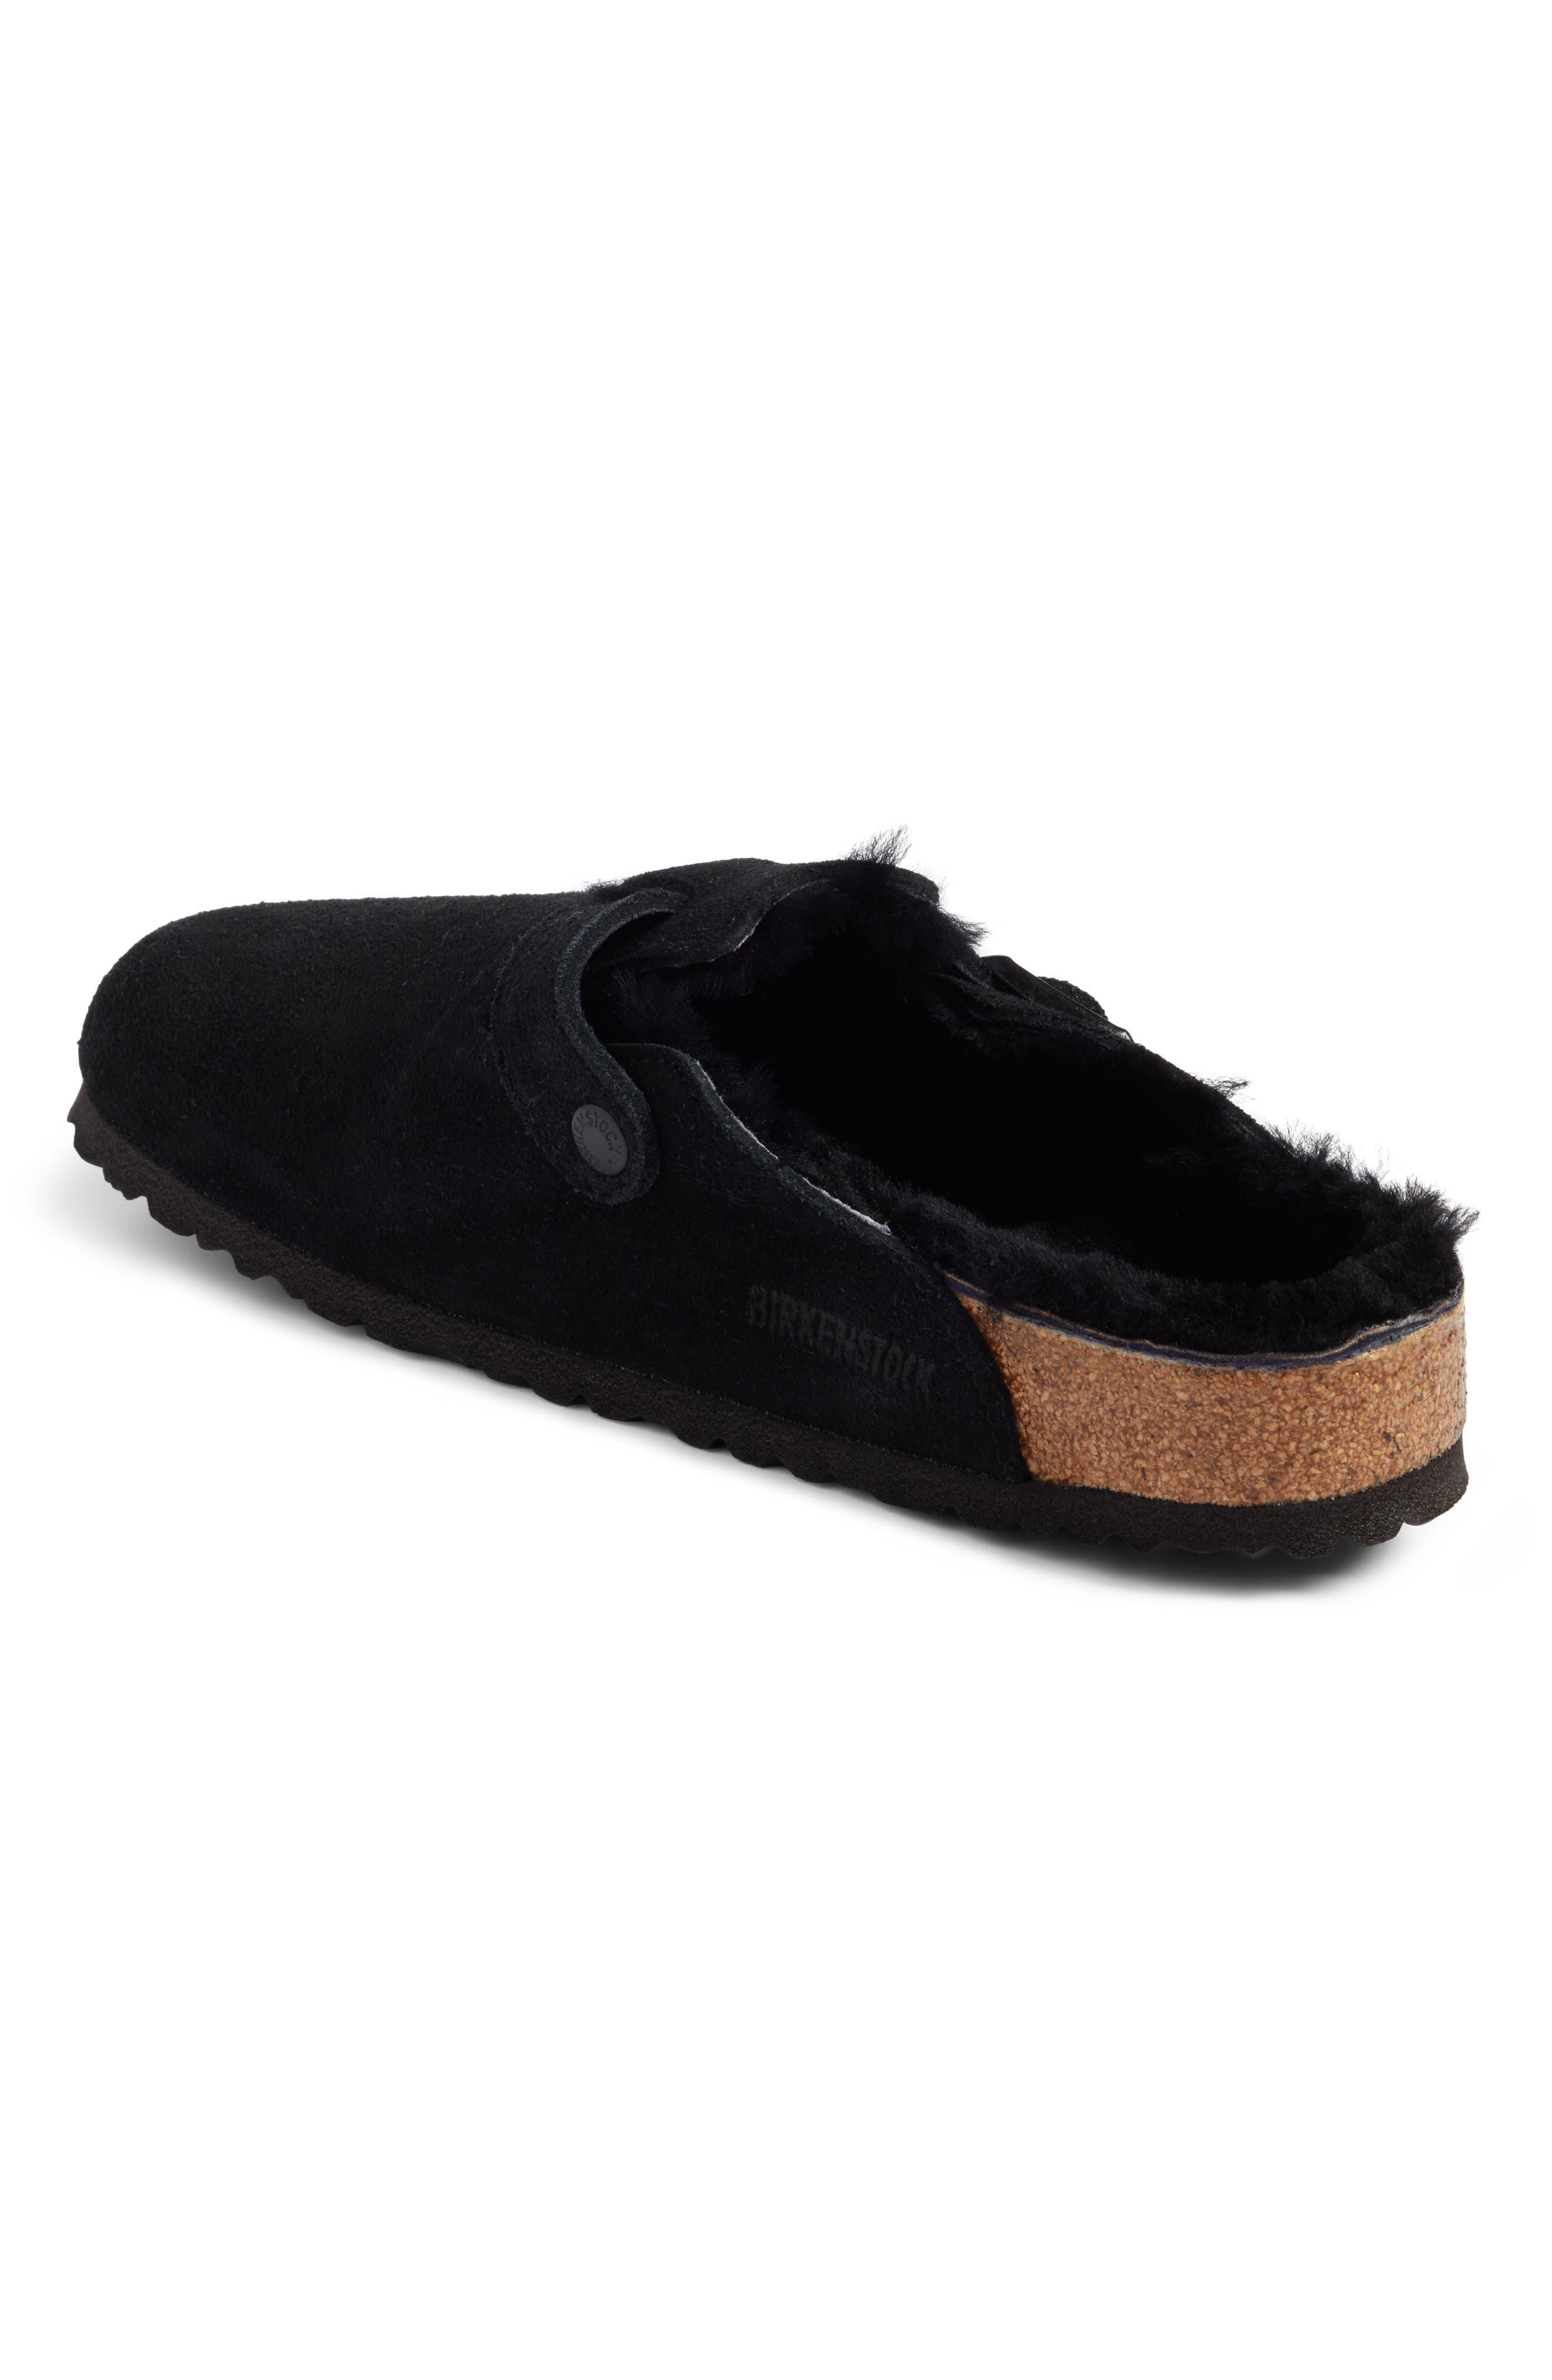 Boston Genuine Shearling Lined Clog,                             Alternate thumbnail 2, color,                             Black/ Black